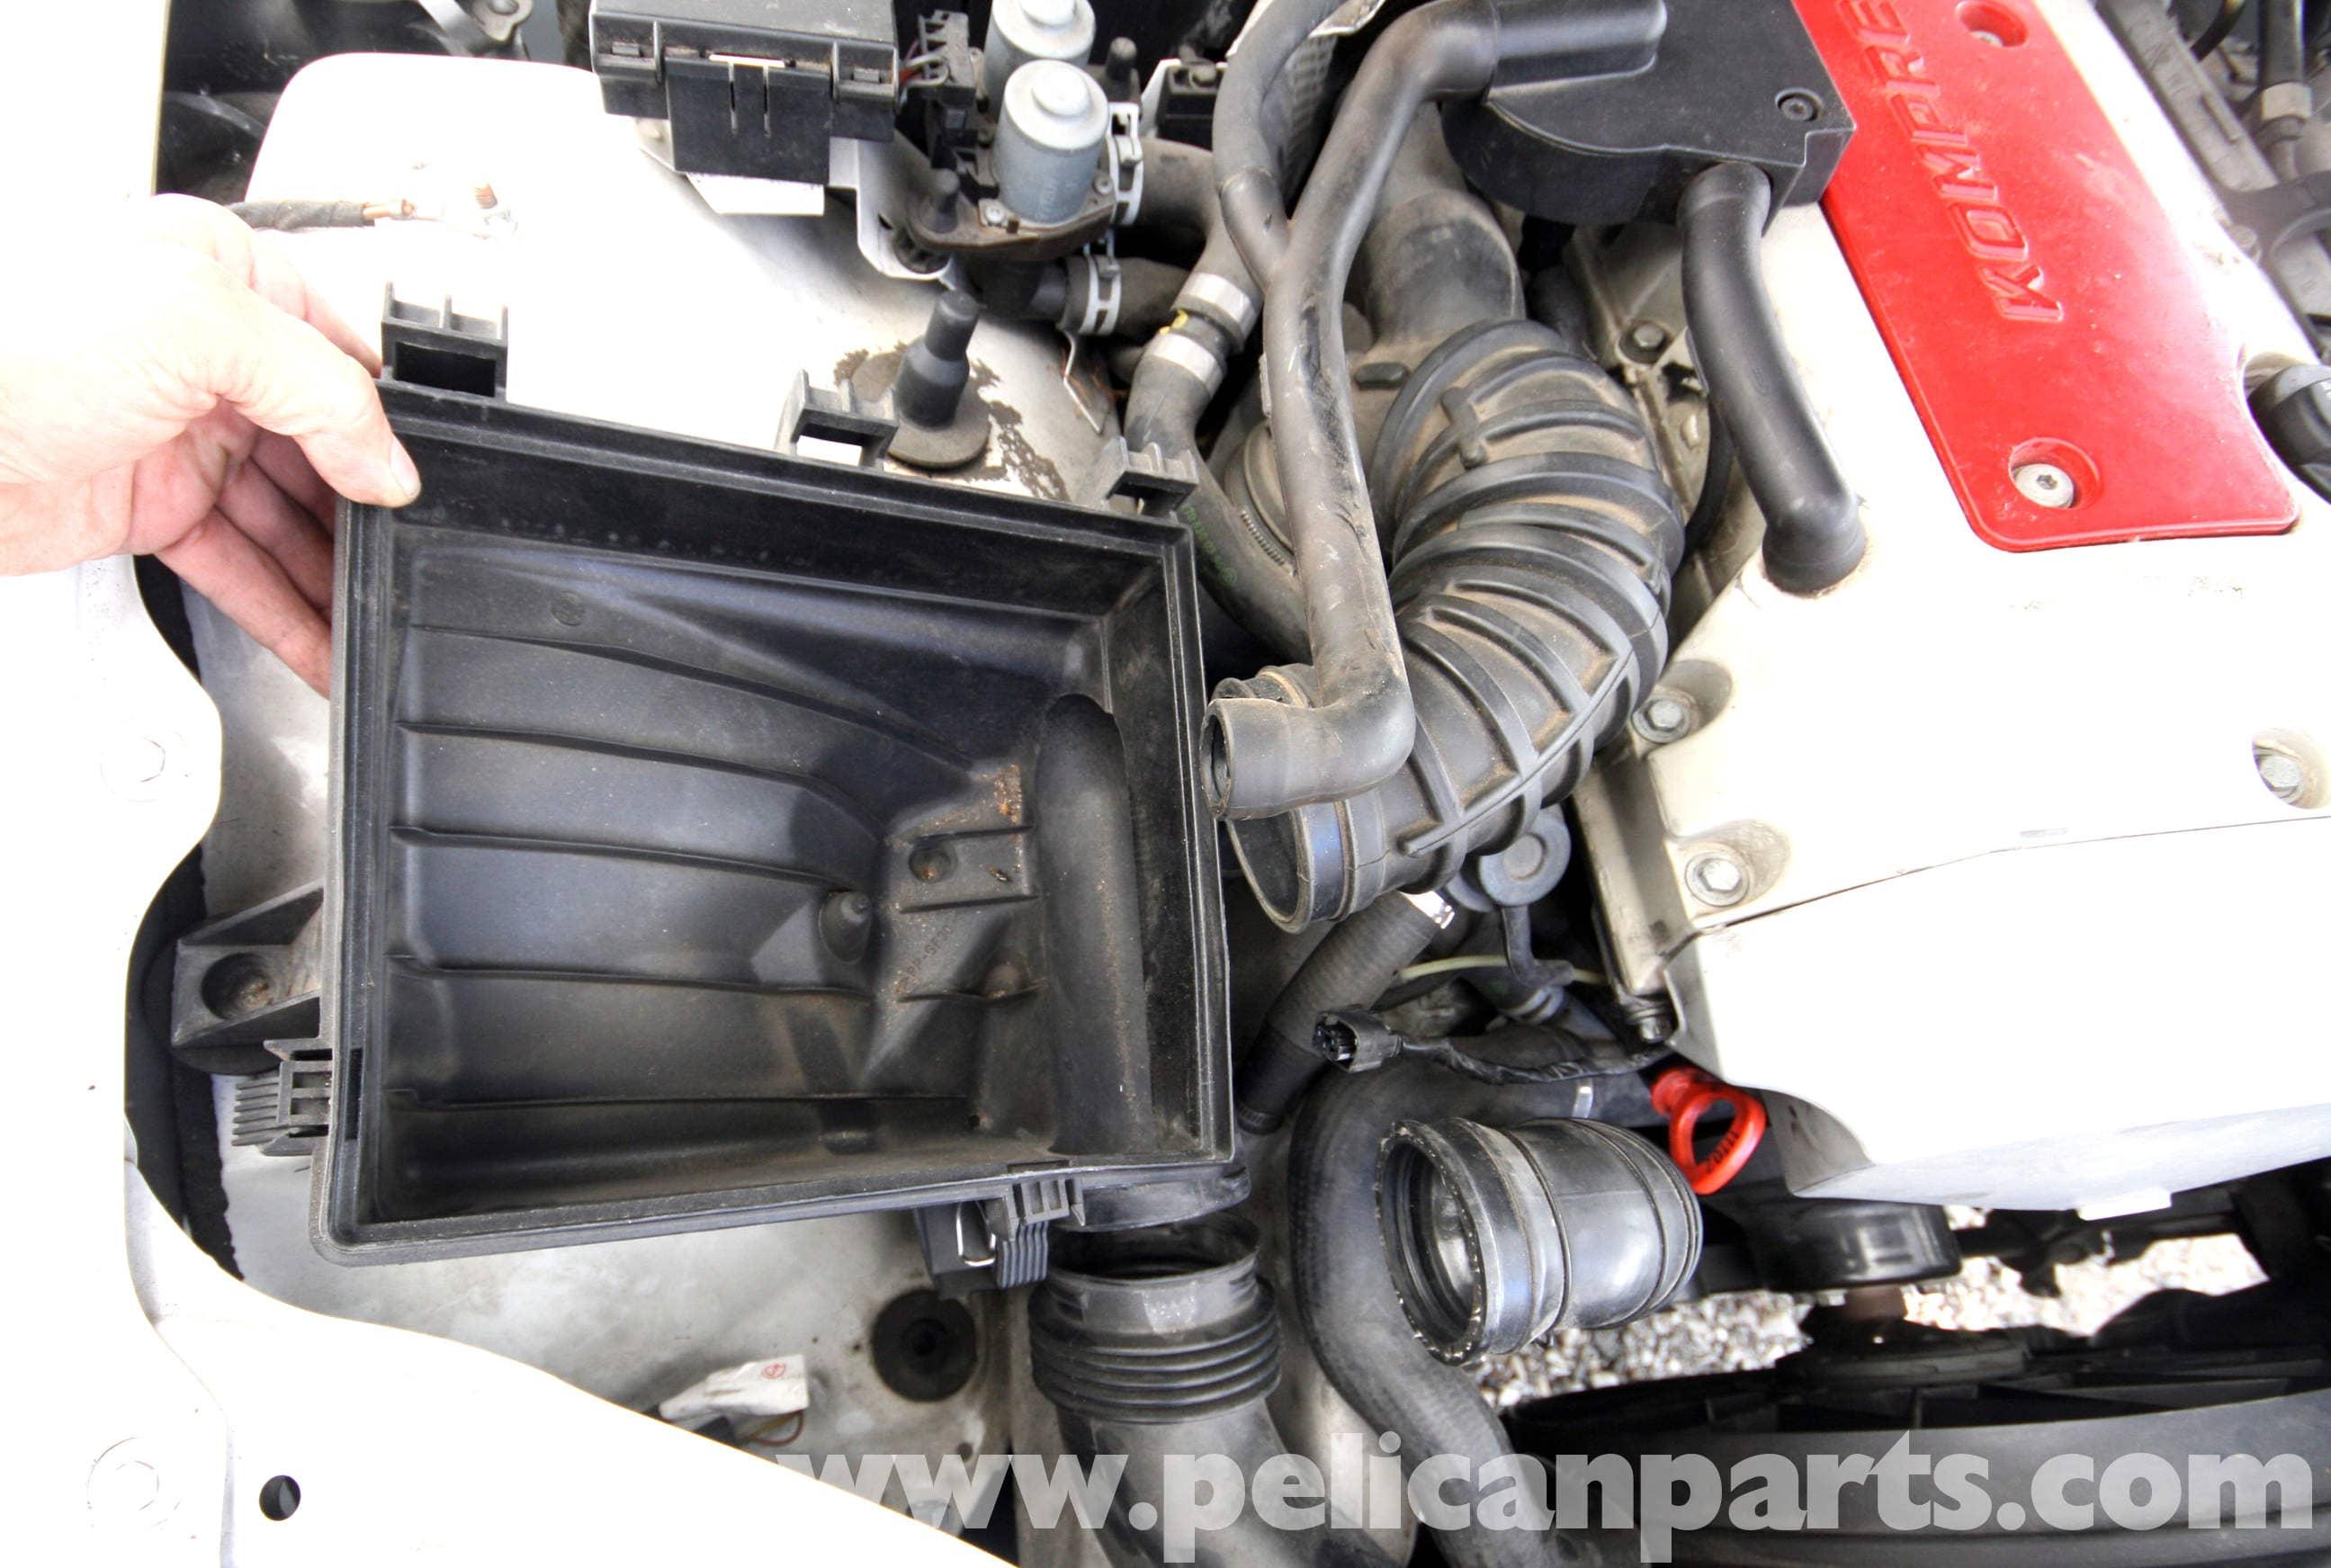 Mercedes Benz Slk 230 Air Intake Duct Removal 1998 2004